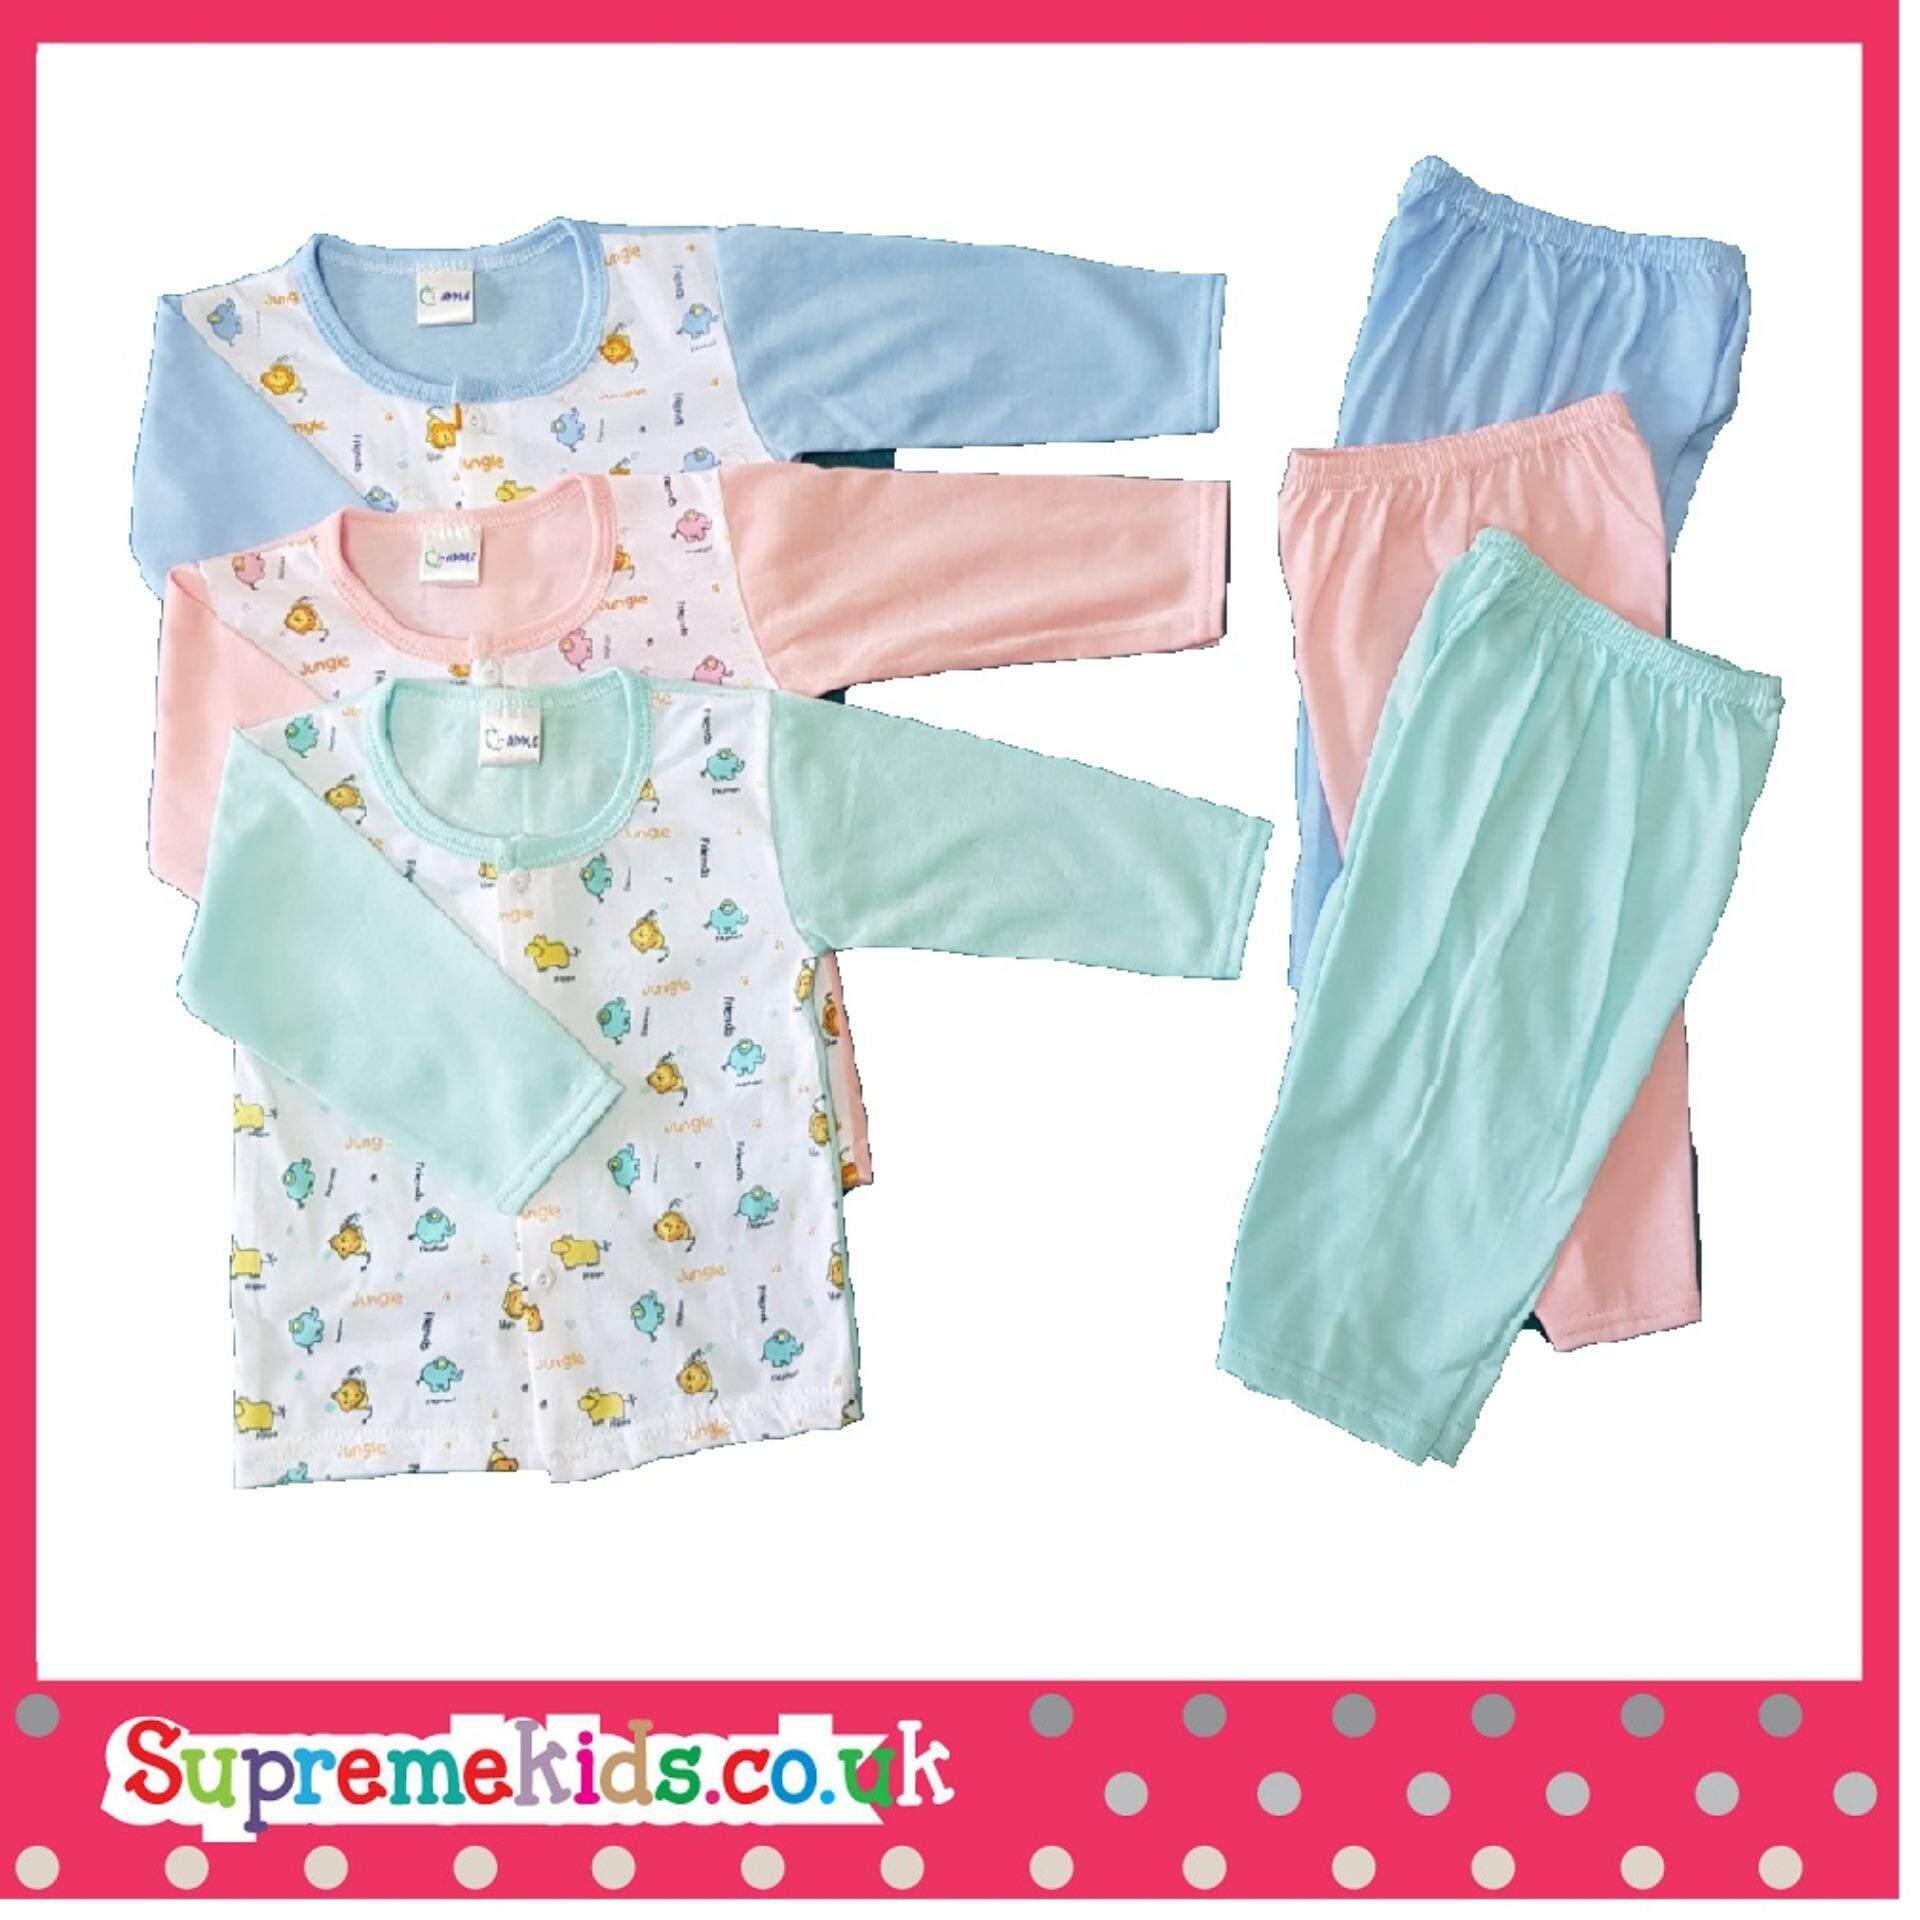 Newborn & Baby 3 SET Full Printing Pajamas -303 (Fit to Age: 6-18Mth Mass:8-12kg Height:69-80CM)